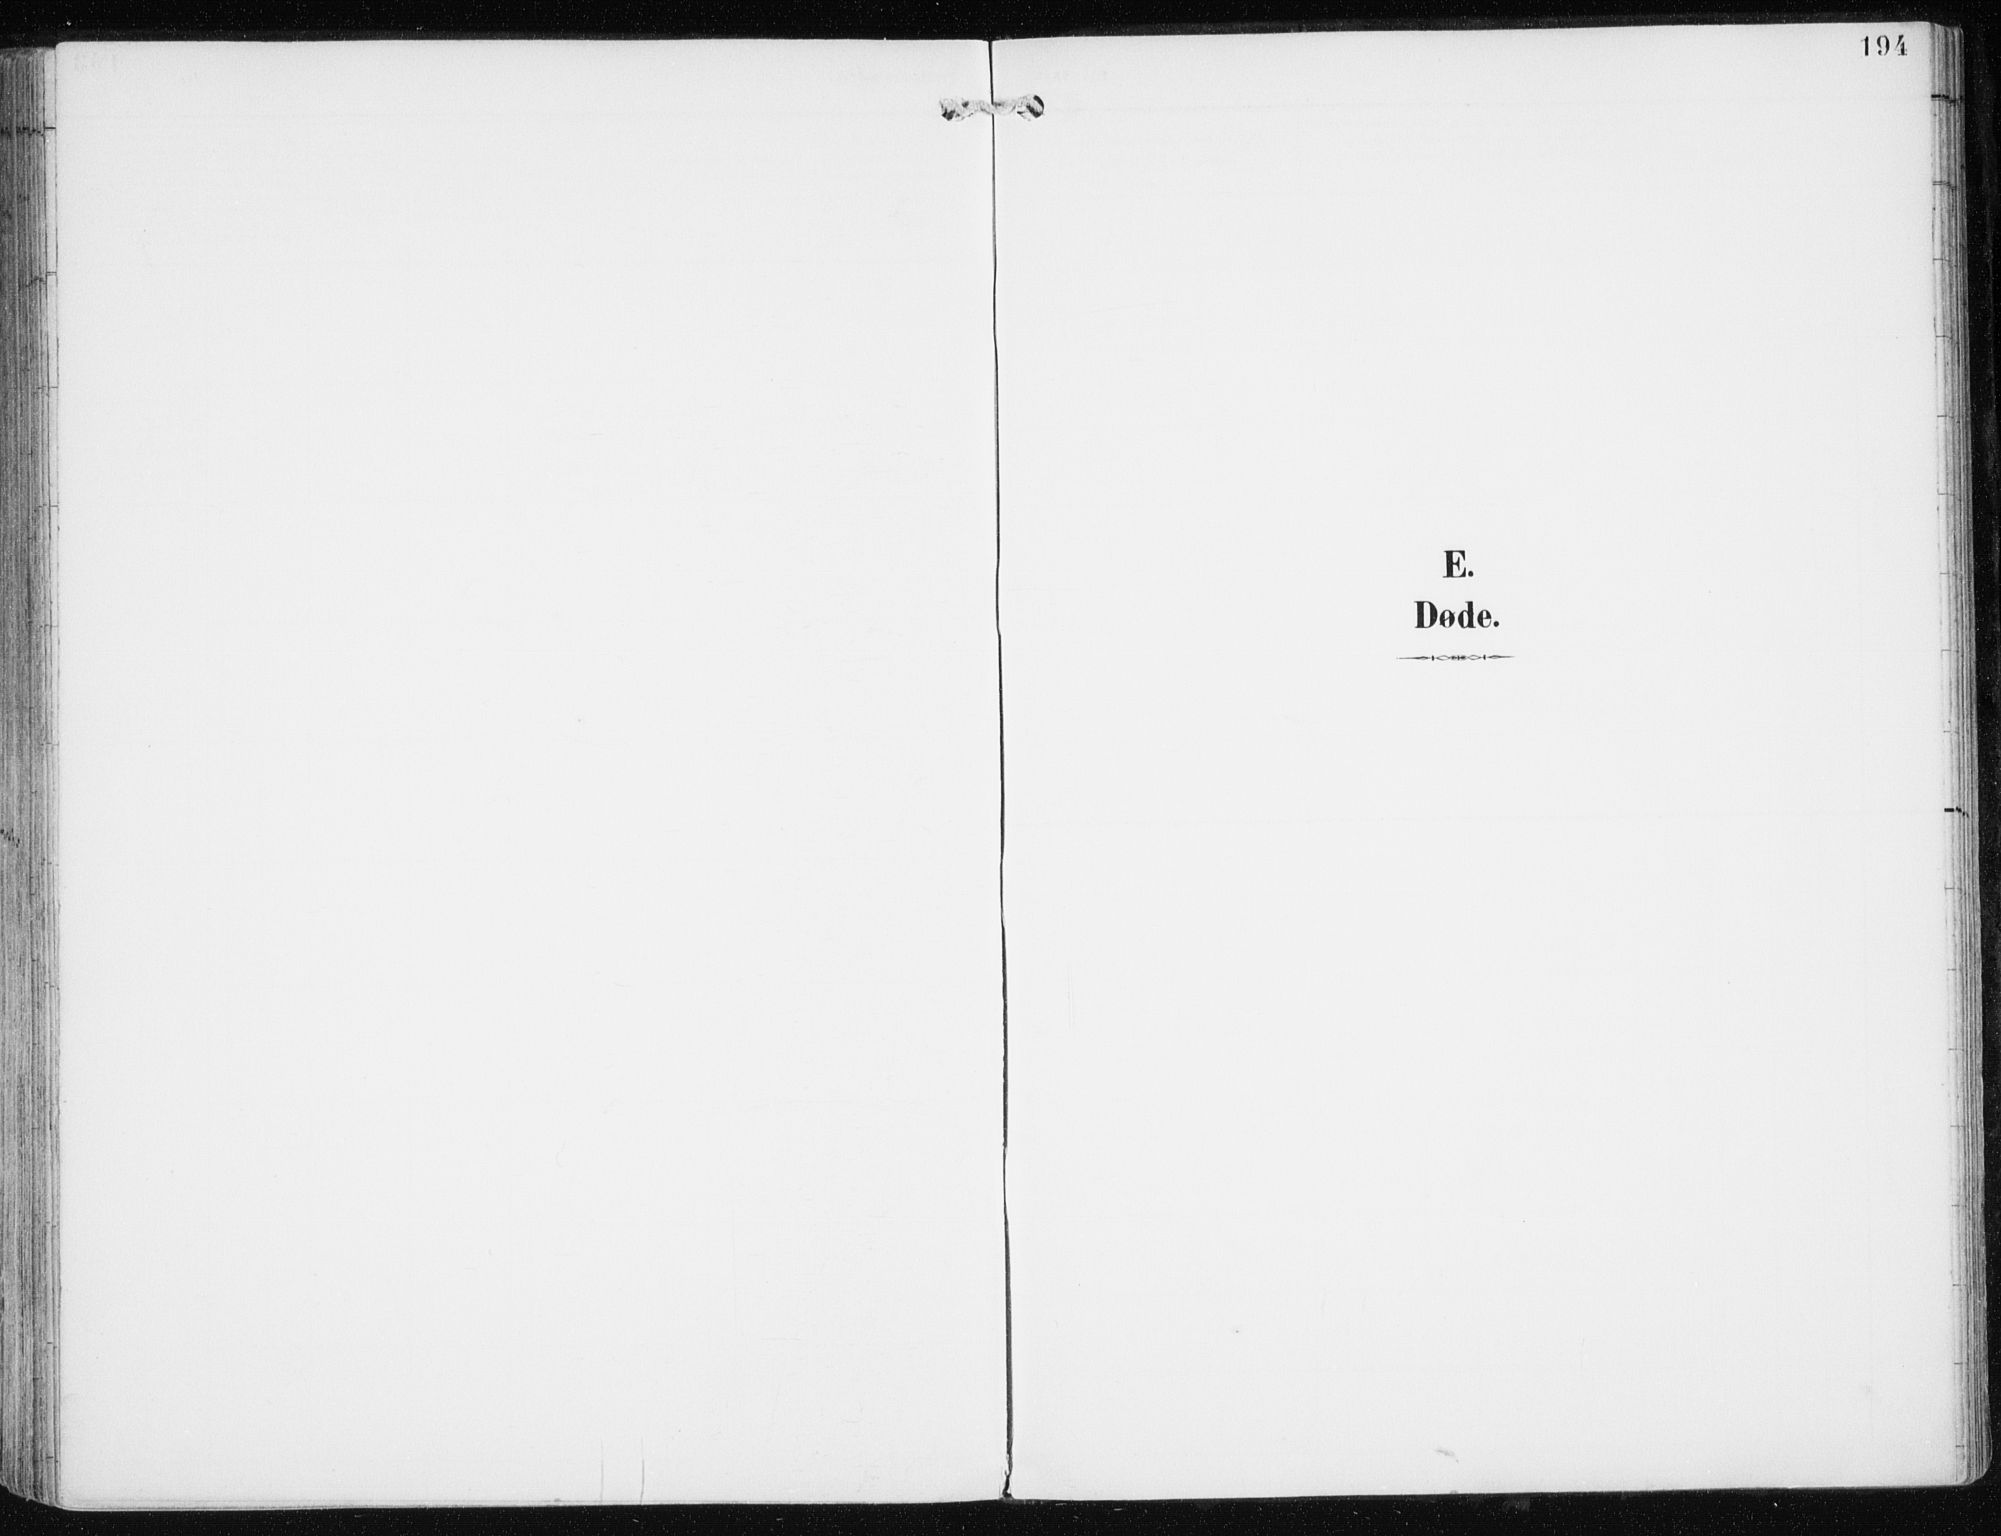 SATØ, Skjervøy sokneprestkontor, H/Ha/Haa/L0017kirke: Ministerialbok nr. 17, 1895-1911, s. 194